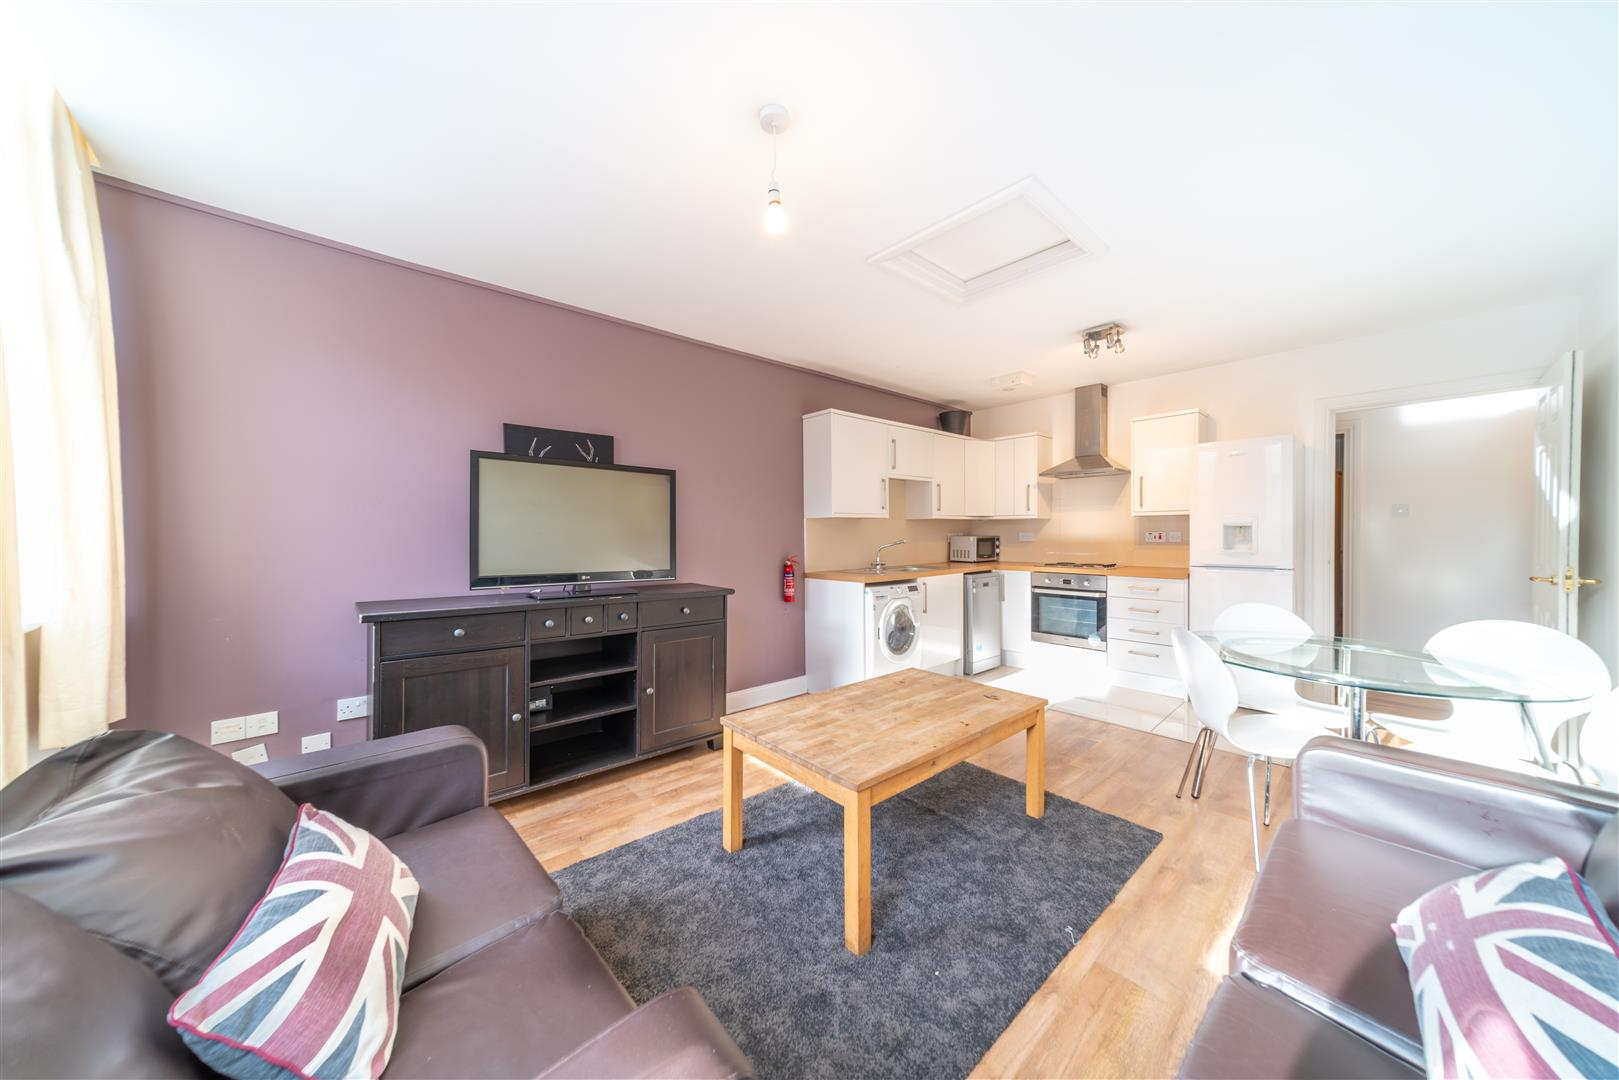 3 bed apartment to rent in City Centre, NE1 5SF, NE1